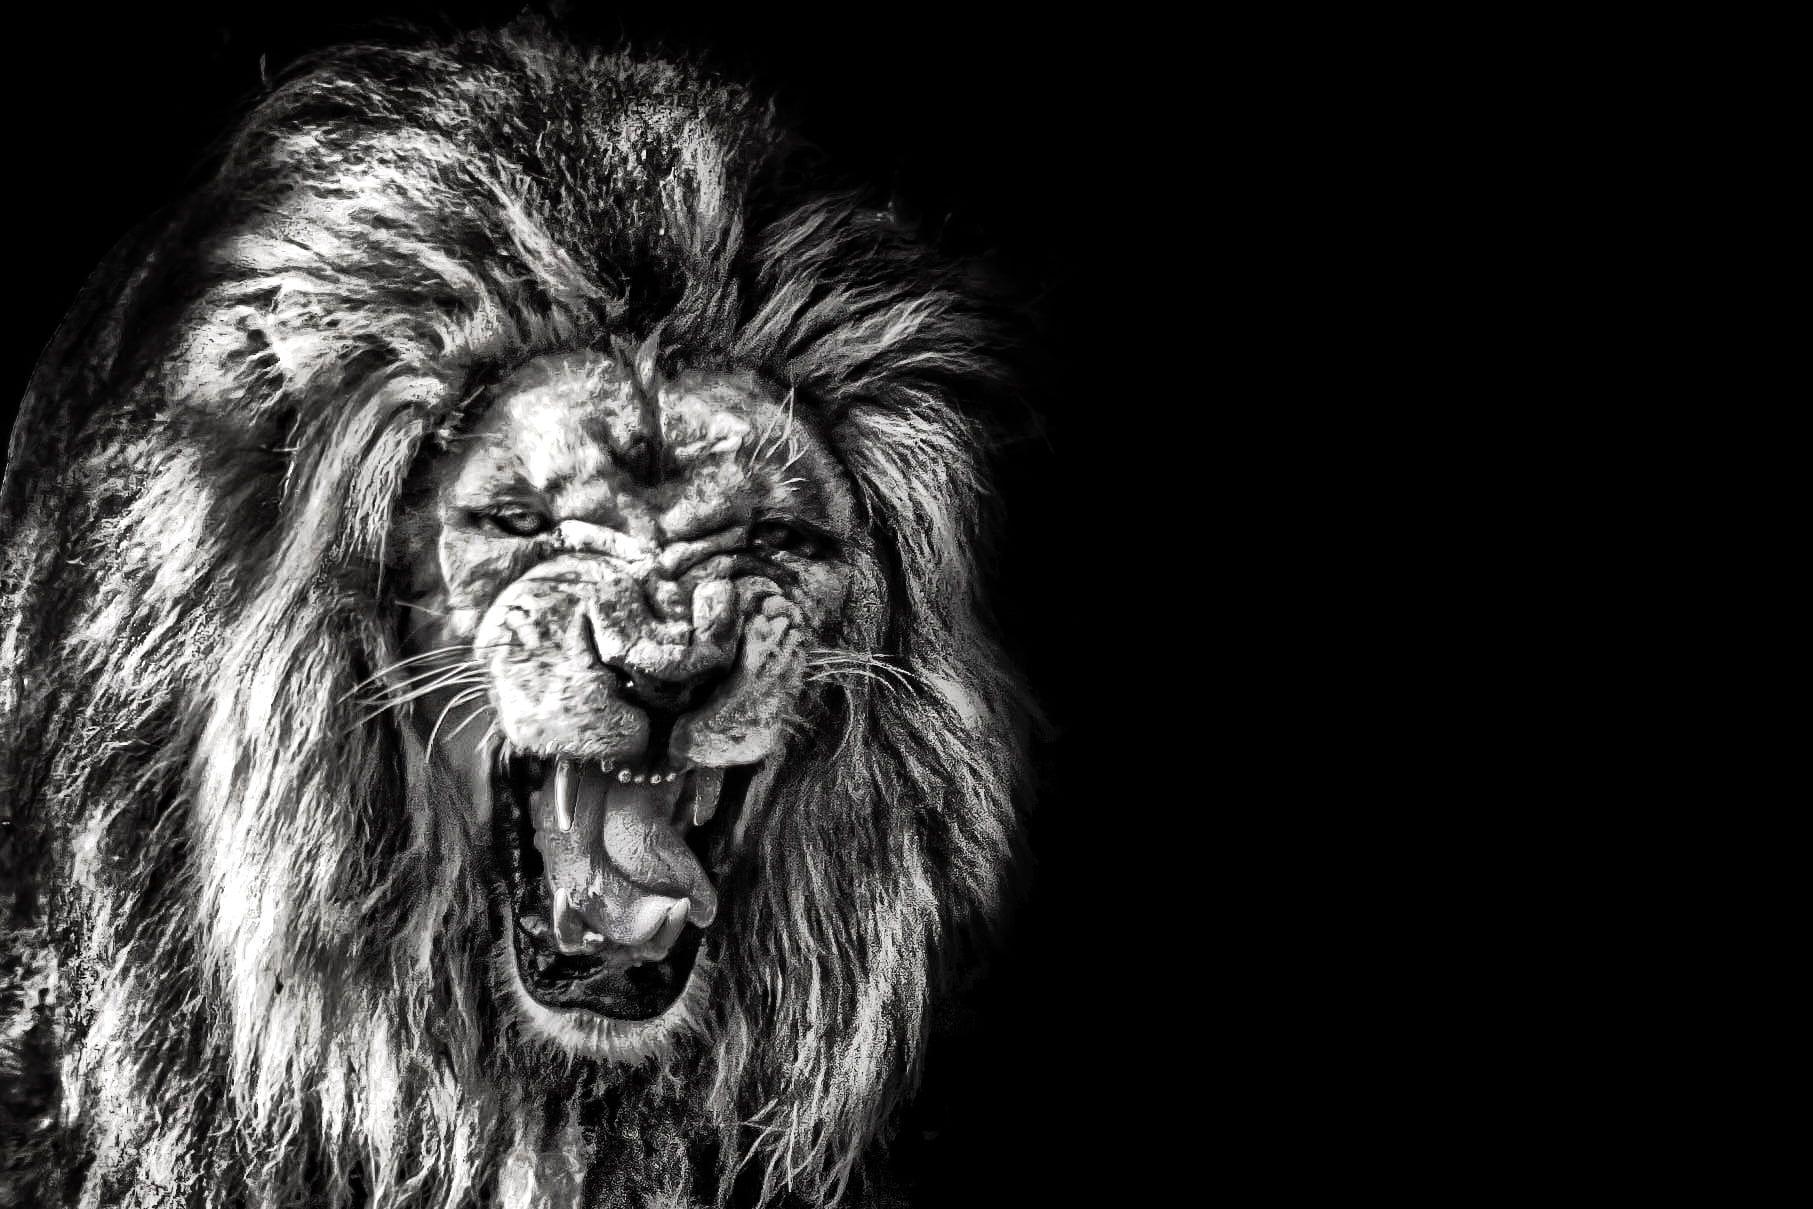 Image Of A Roaring Lion Dowload: Lion Roar Wallpapers